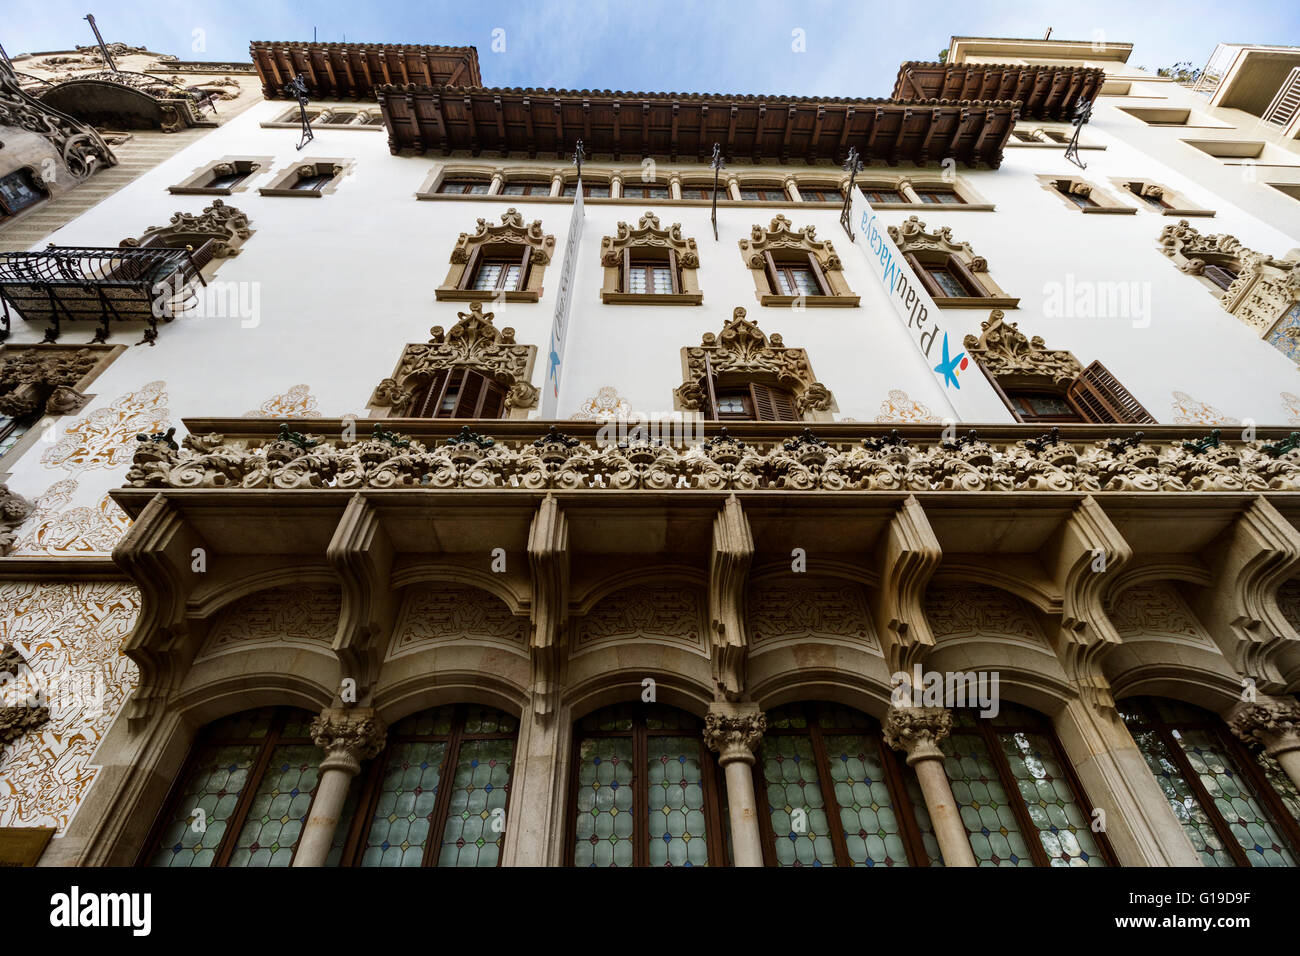 Palau Macaya, by Josep Puig i Cadafalch. 1901. Barcelona. - Stock Image